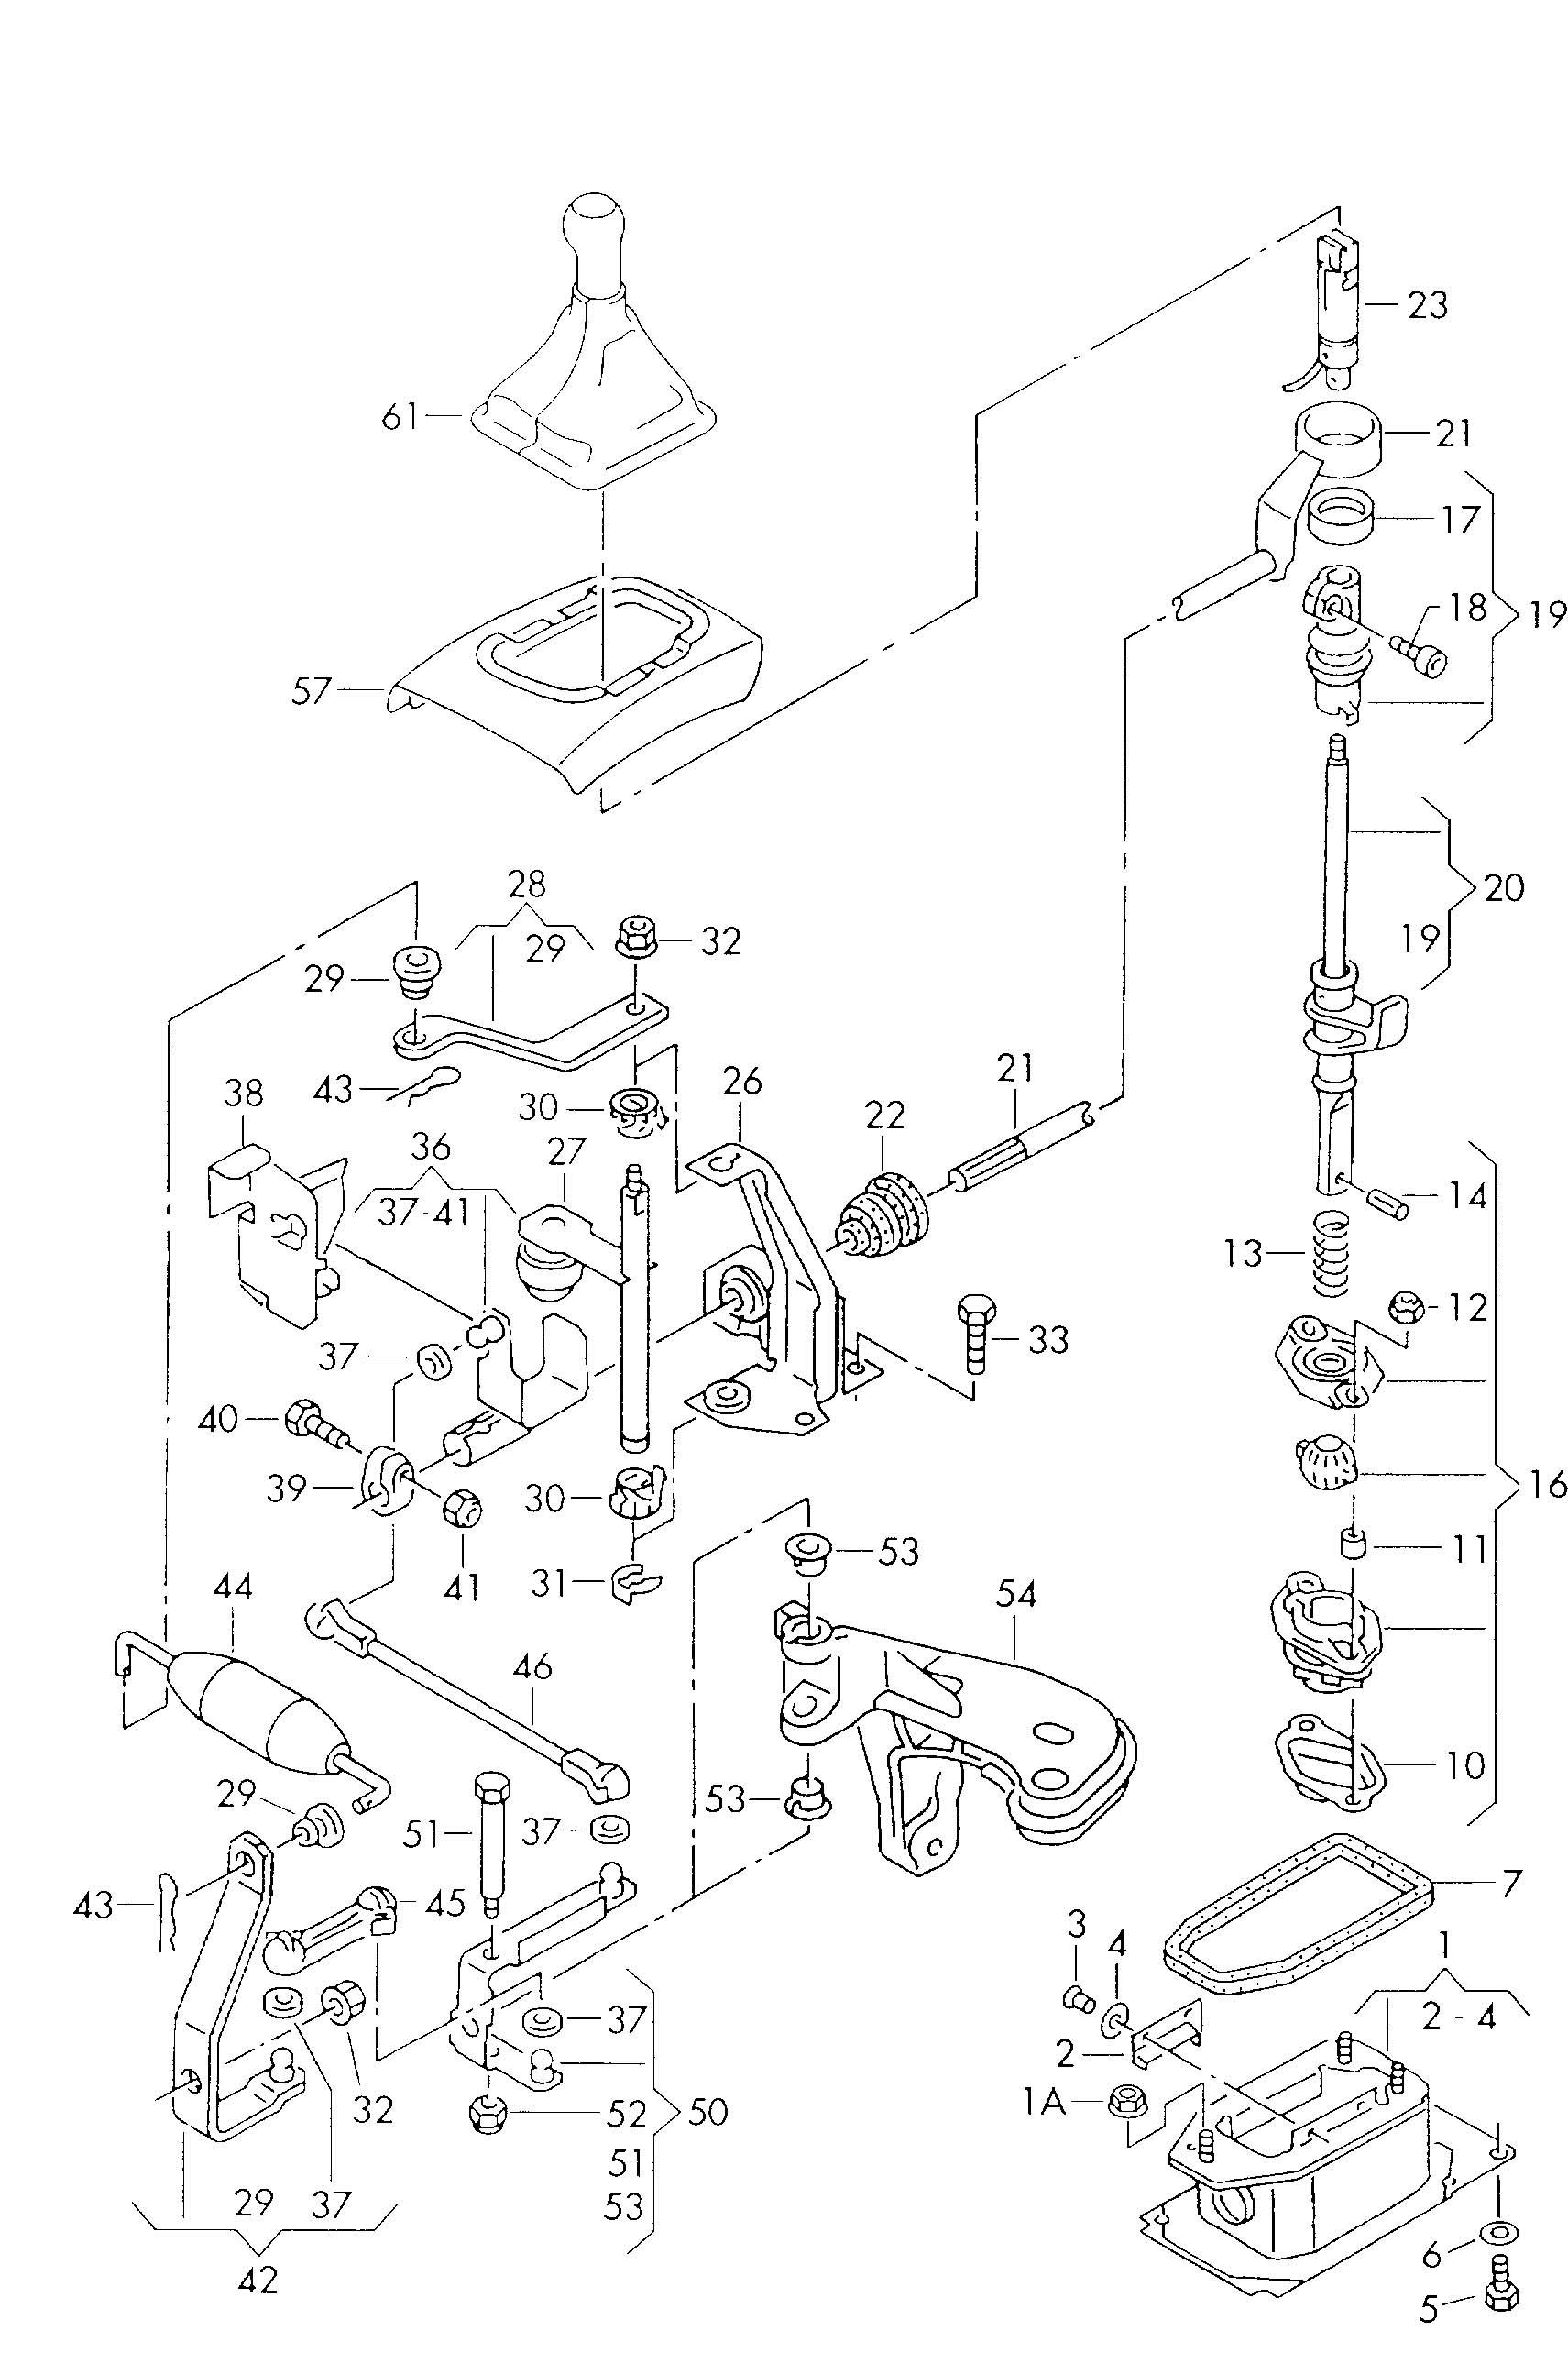 2000 Volkswagen Jetta Comprising: repair kit for relay